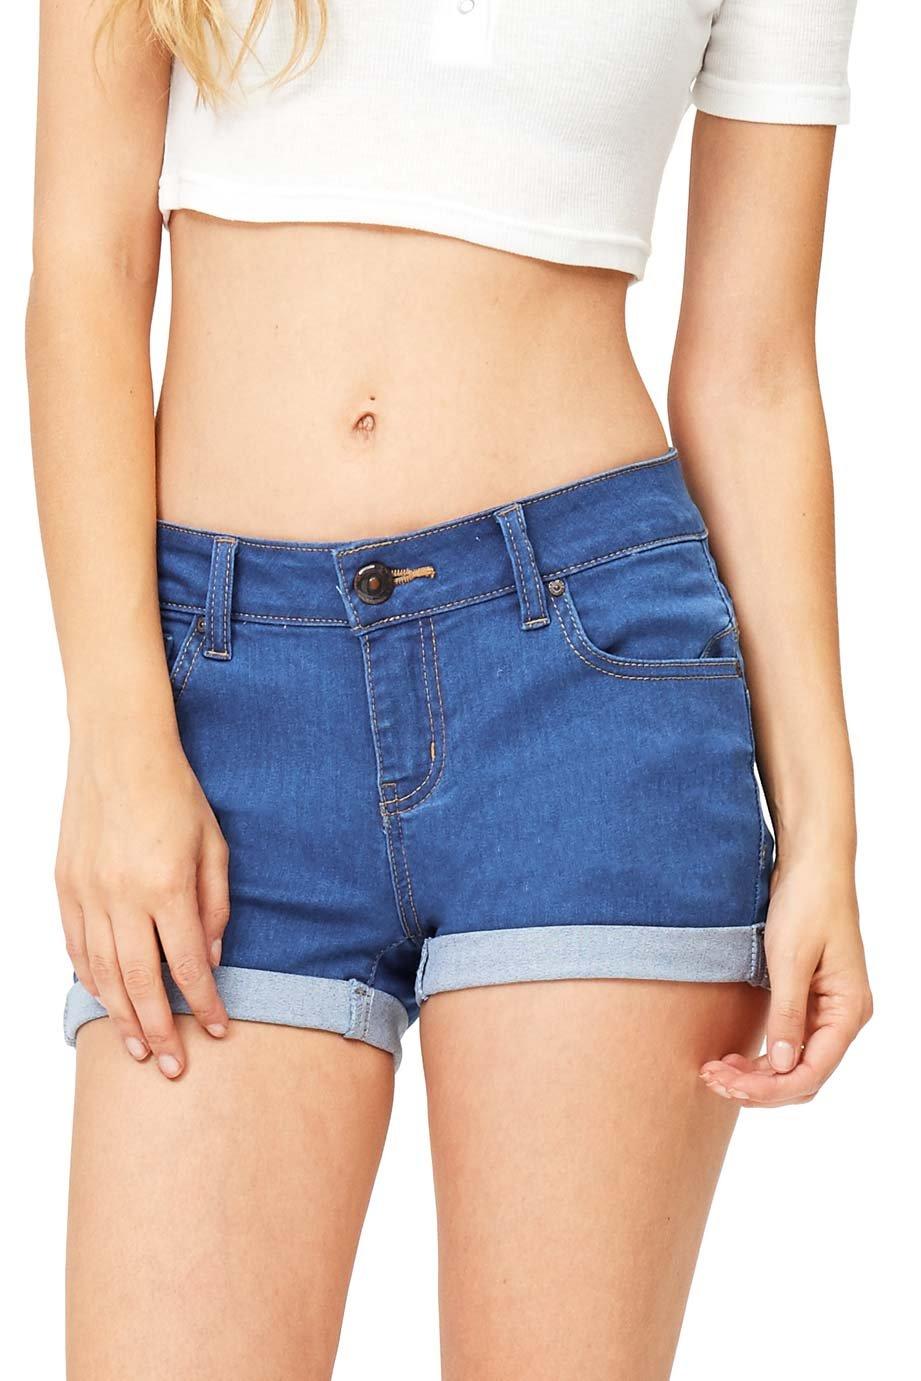 Wax Women's Juniors Perfect Fit Mid-Rise Denim Shorts (XXX-Large, Blue)